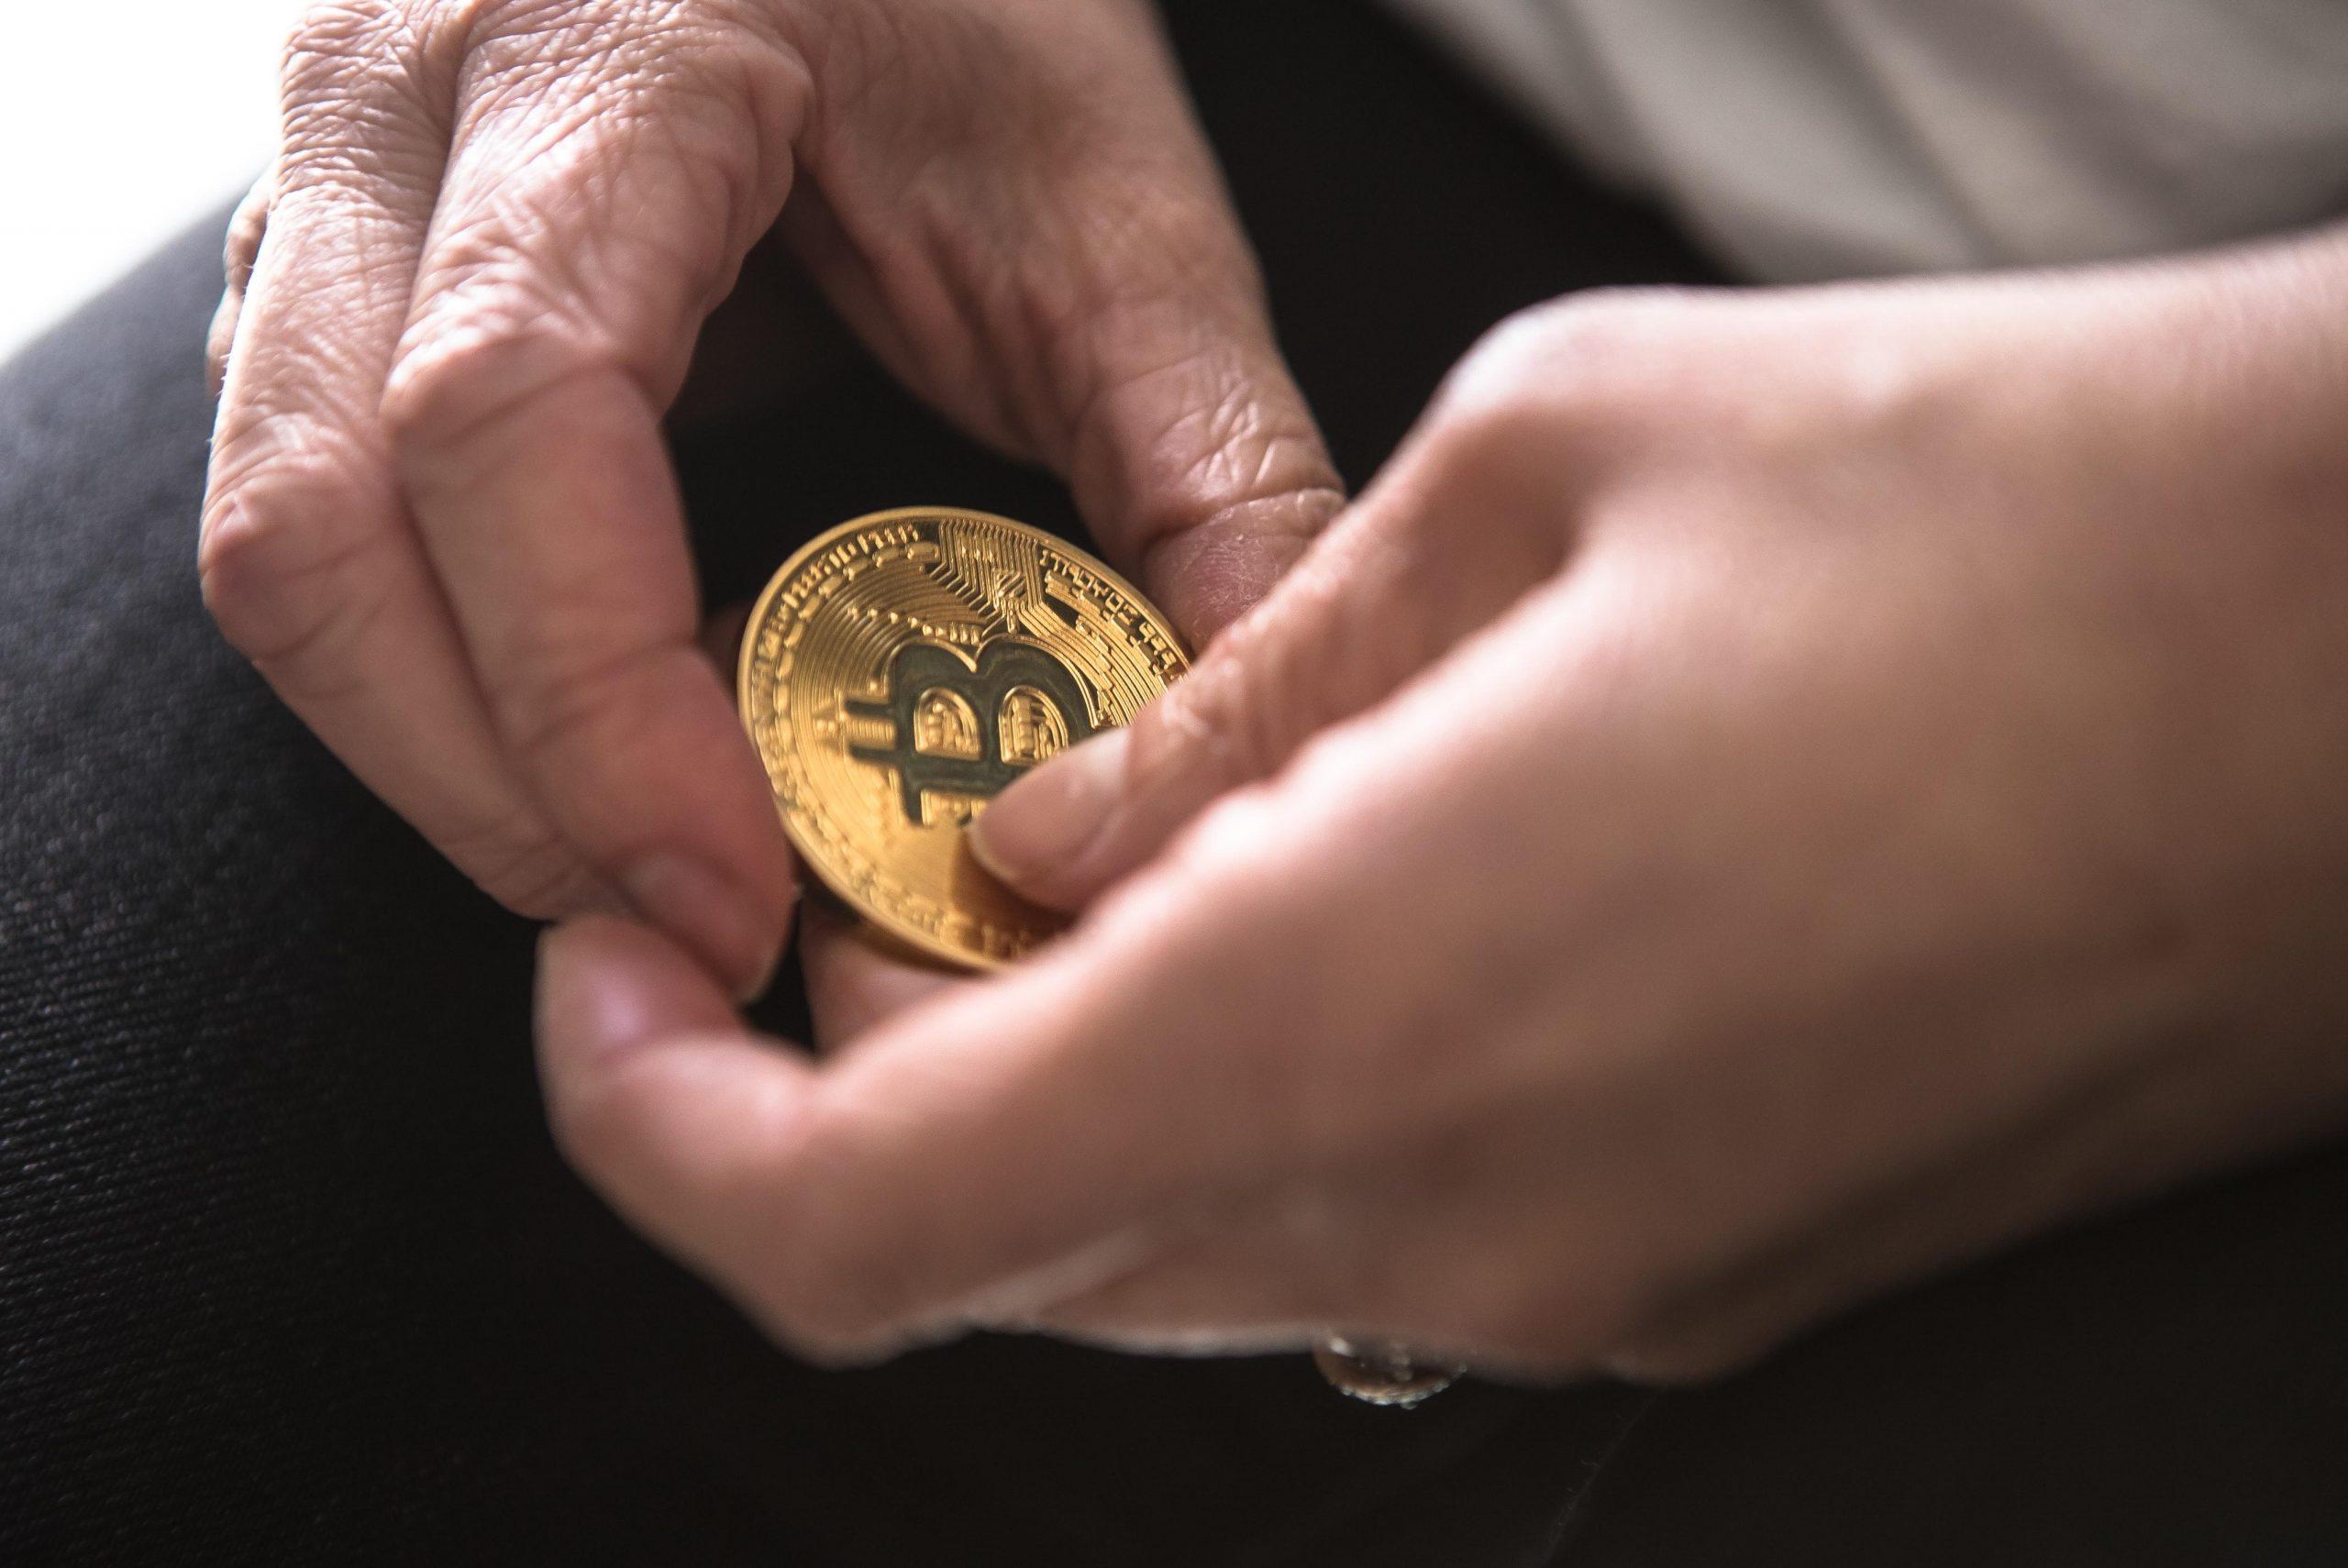 Why Bitcoin Dropping Again? 5 Reasons Behind It